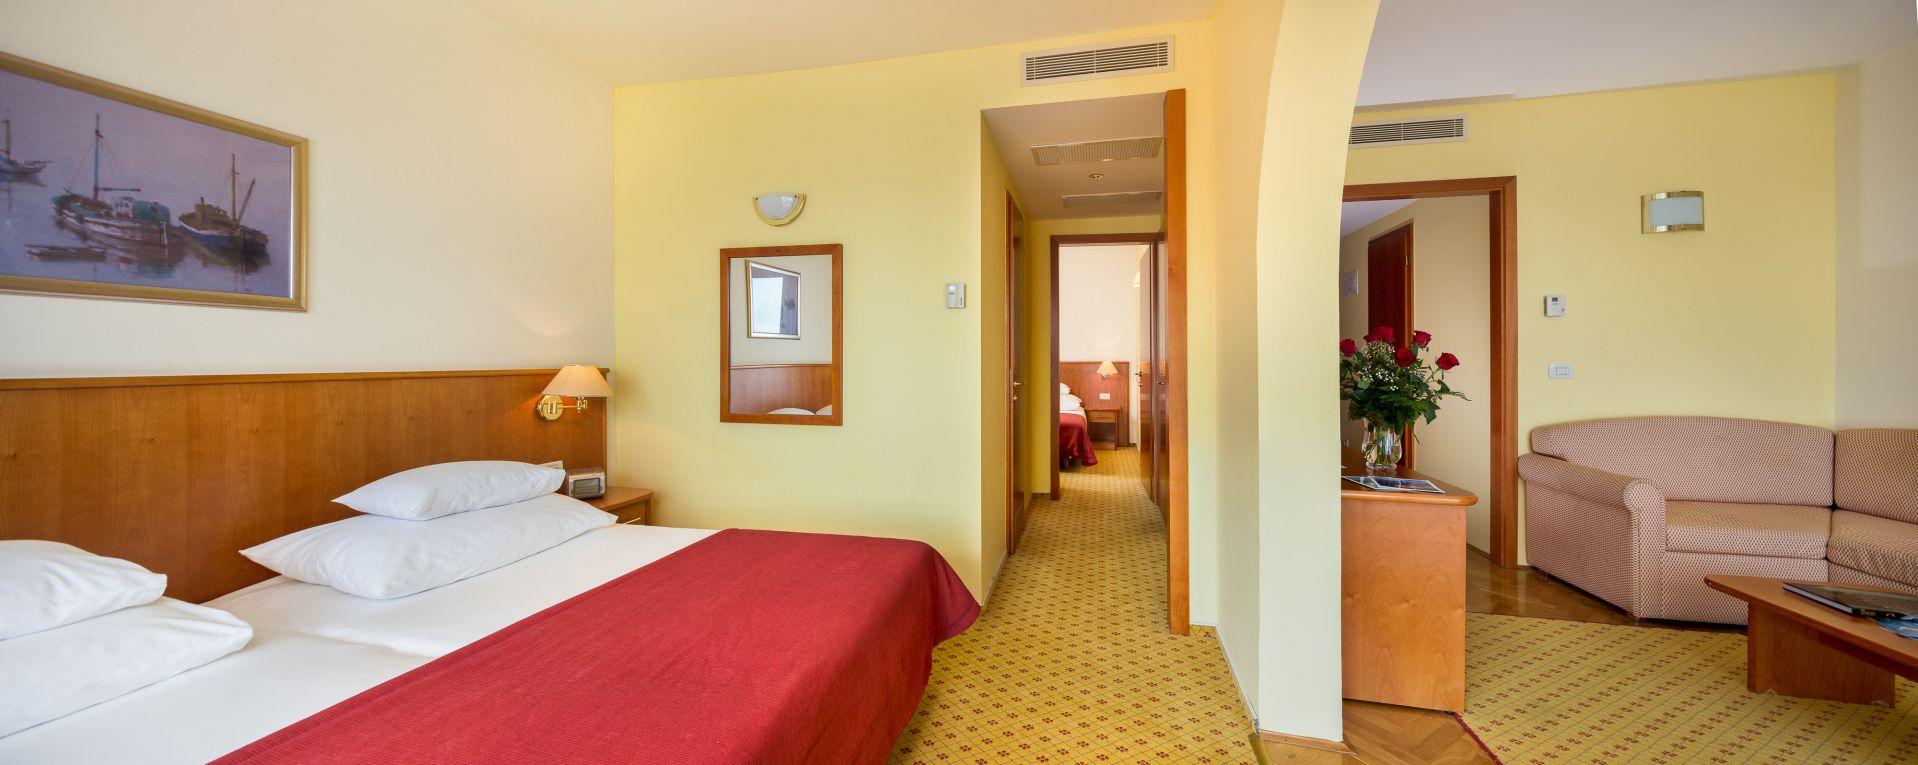 premier club suite 01 14638824578 o - Zora Hotel